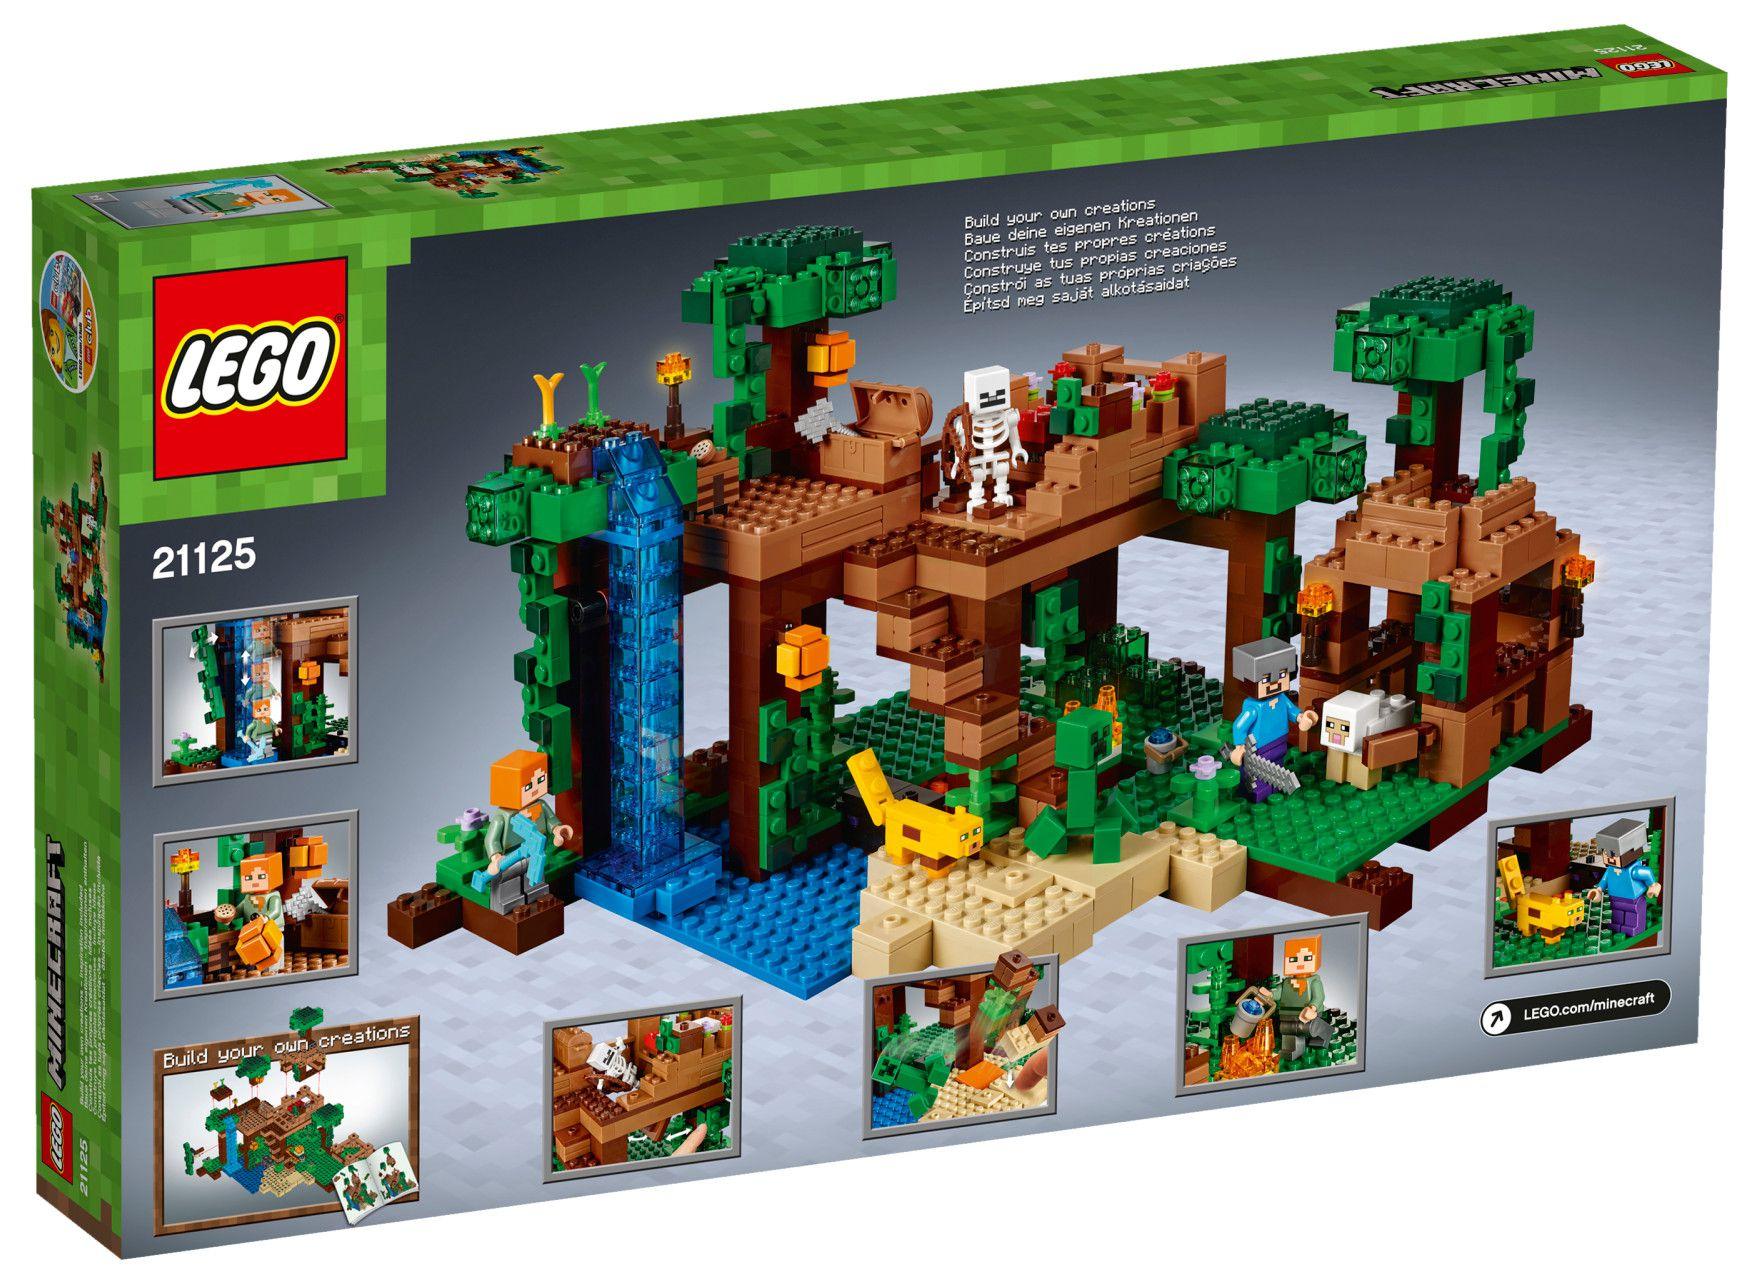 lego minecraft 21125 la cabane dans l 39 arbre de la jungle achat vente assemblage. Black Bedroom Furniture Sets. Home Design Ideas